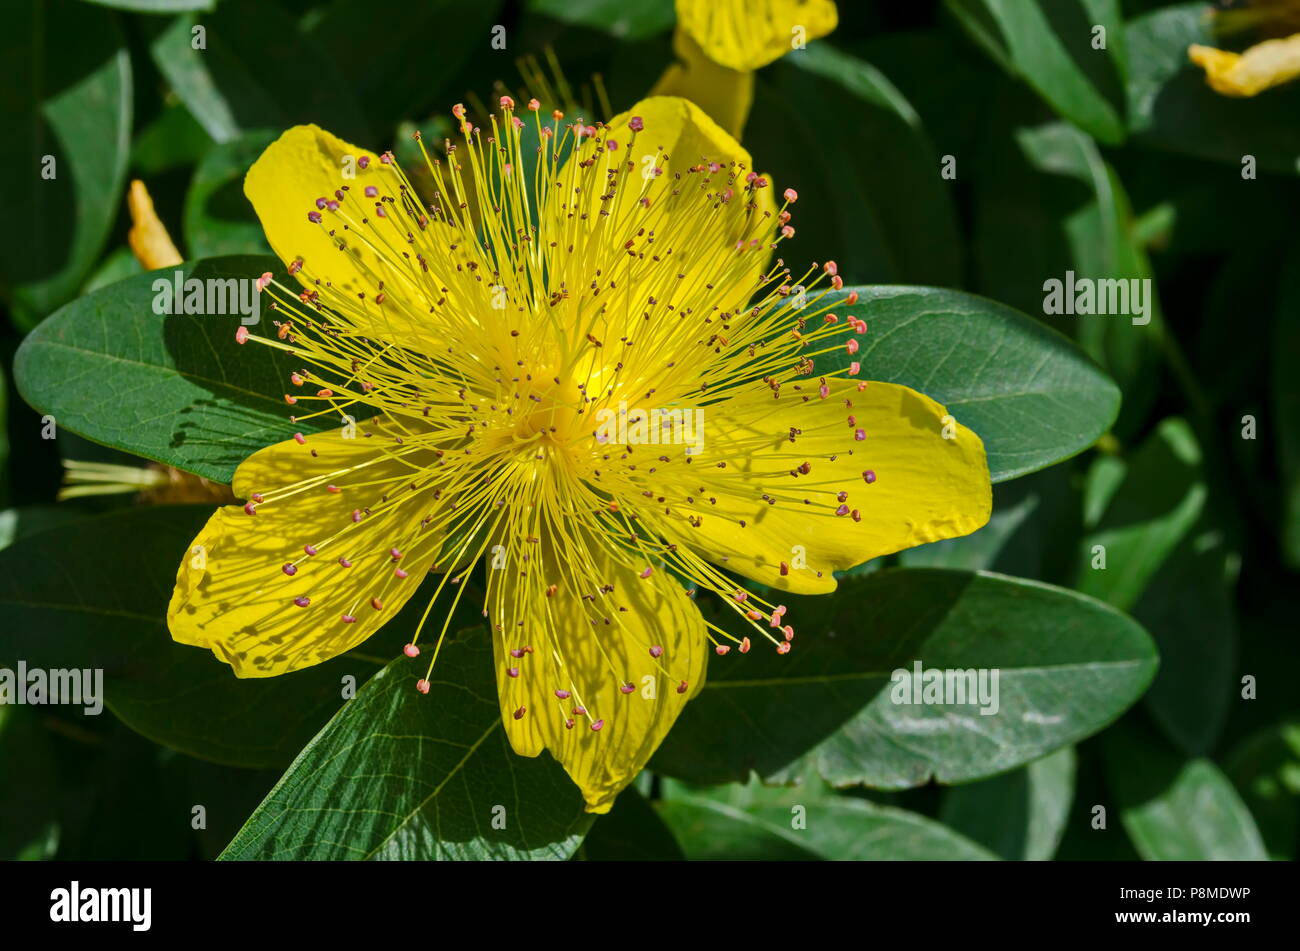 Hypericum Calycinum St Johns Wort Or Yellow Rose Of Sharon Bush